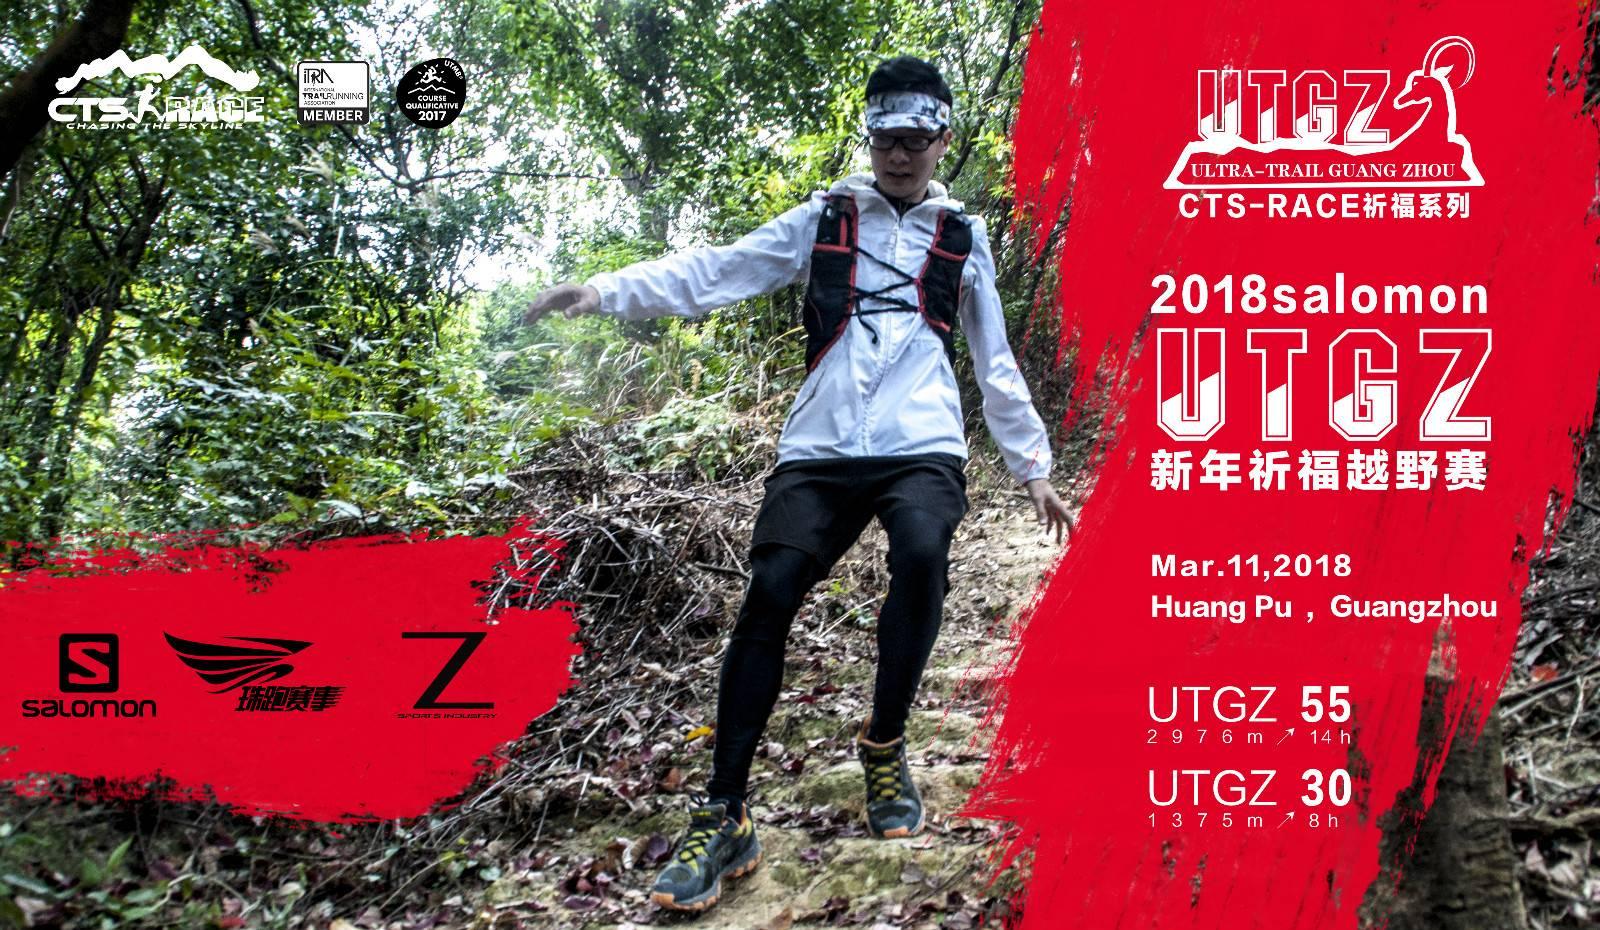 2018 salomon UTGZ祈福越野跑